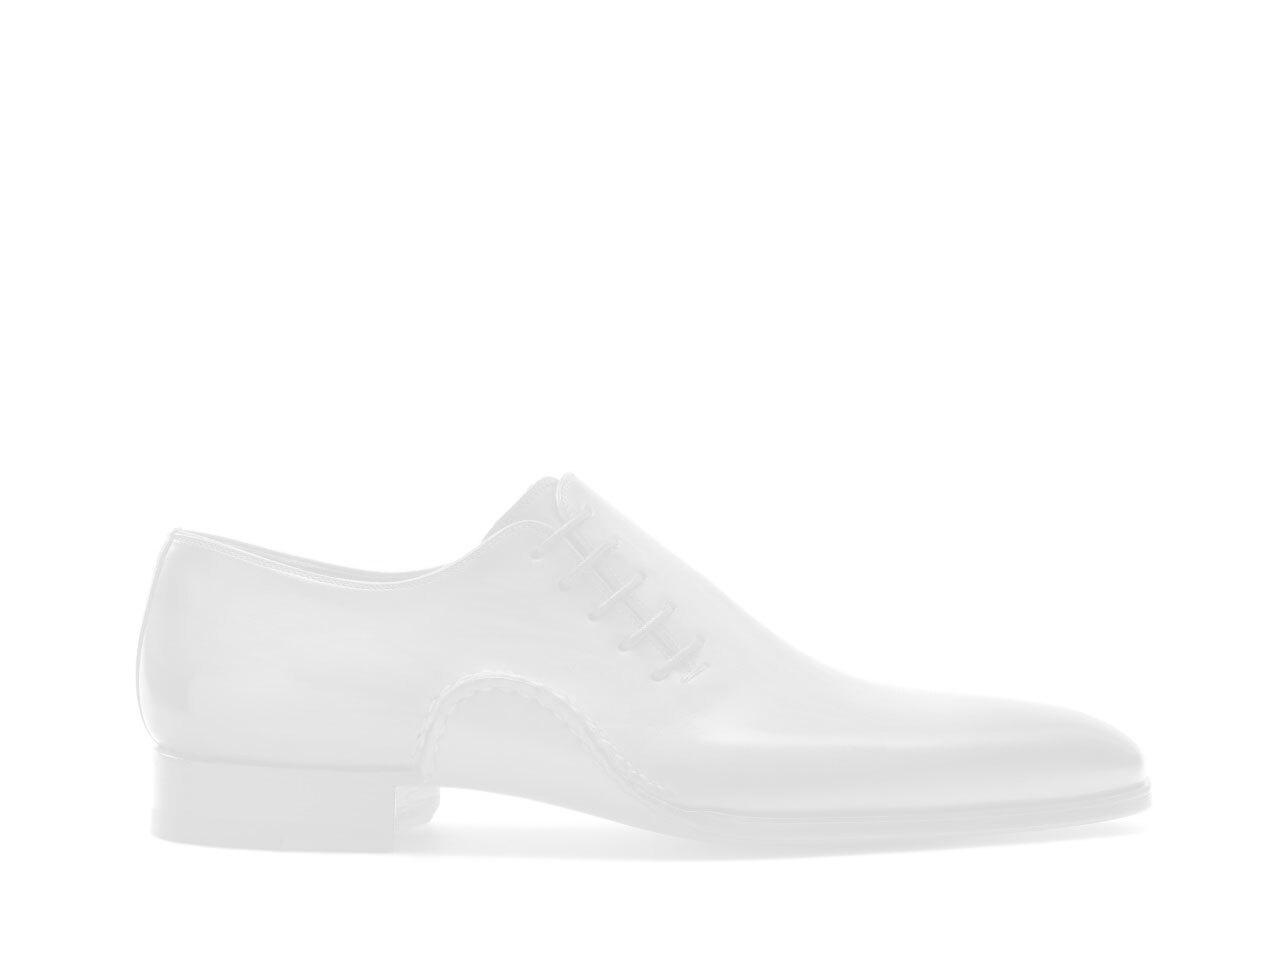 Pair of the Magnanni Sapor Black Men's Sneakers